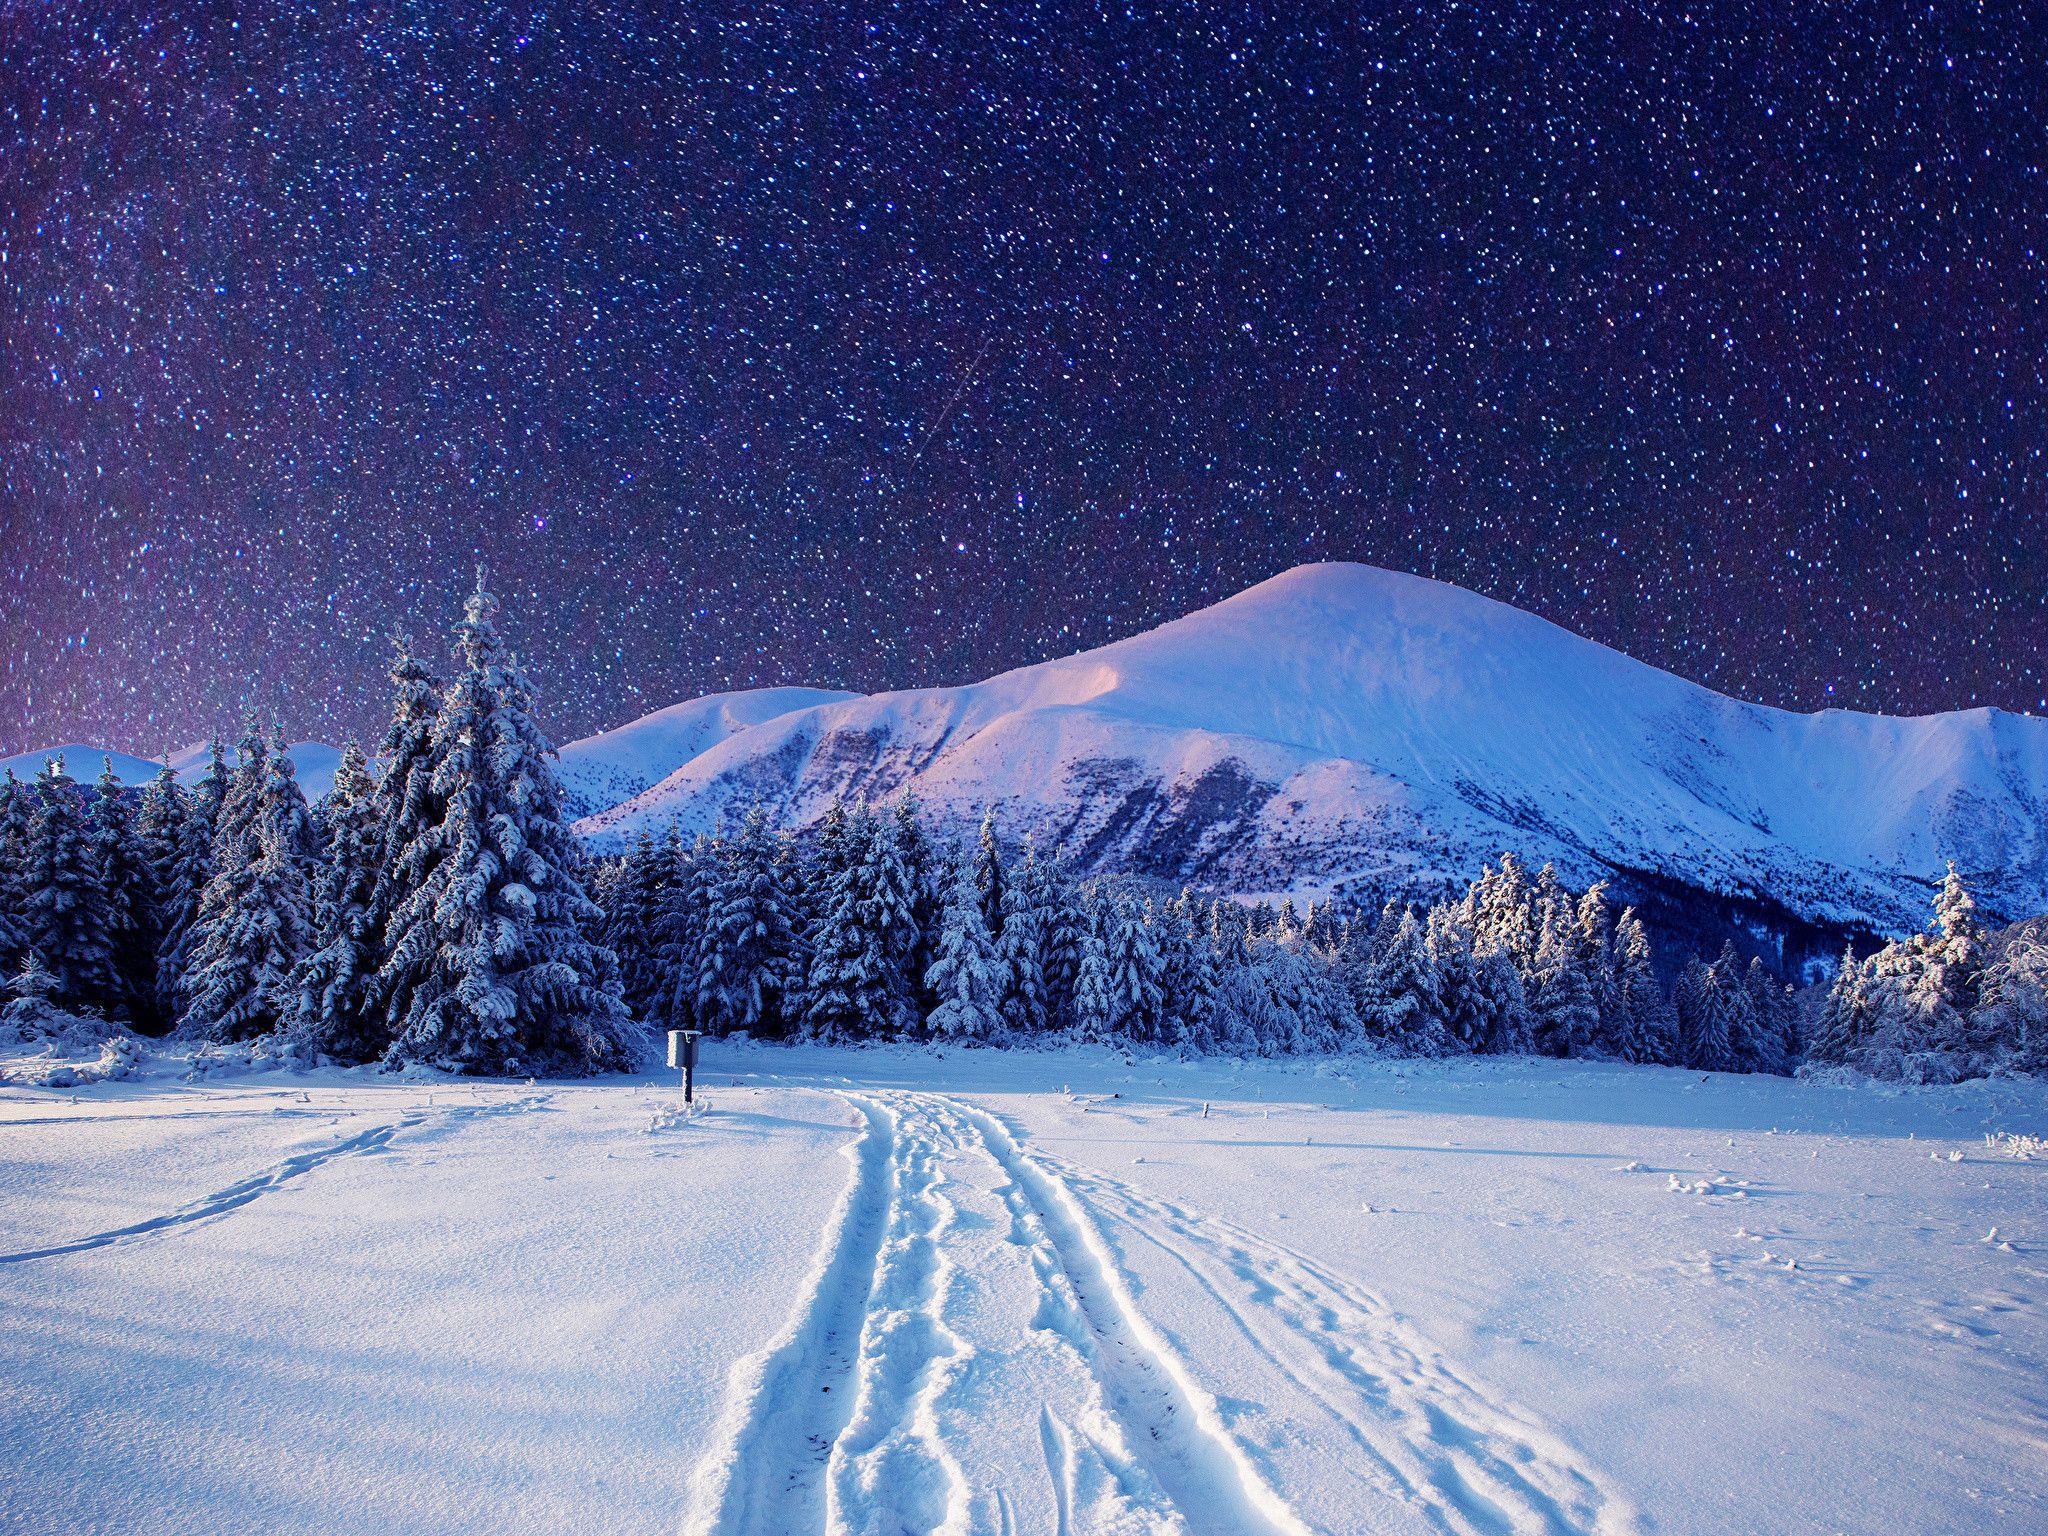 Cold Winter Night Sky Full With Stars Wonderful Landscape Beautiful Nature Landscapes Deskt Night Sky Wallpaper Winter Wallpaper Desktop Landscape Wallpaper